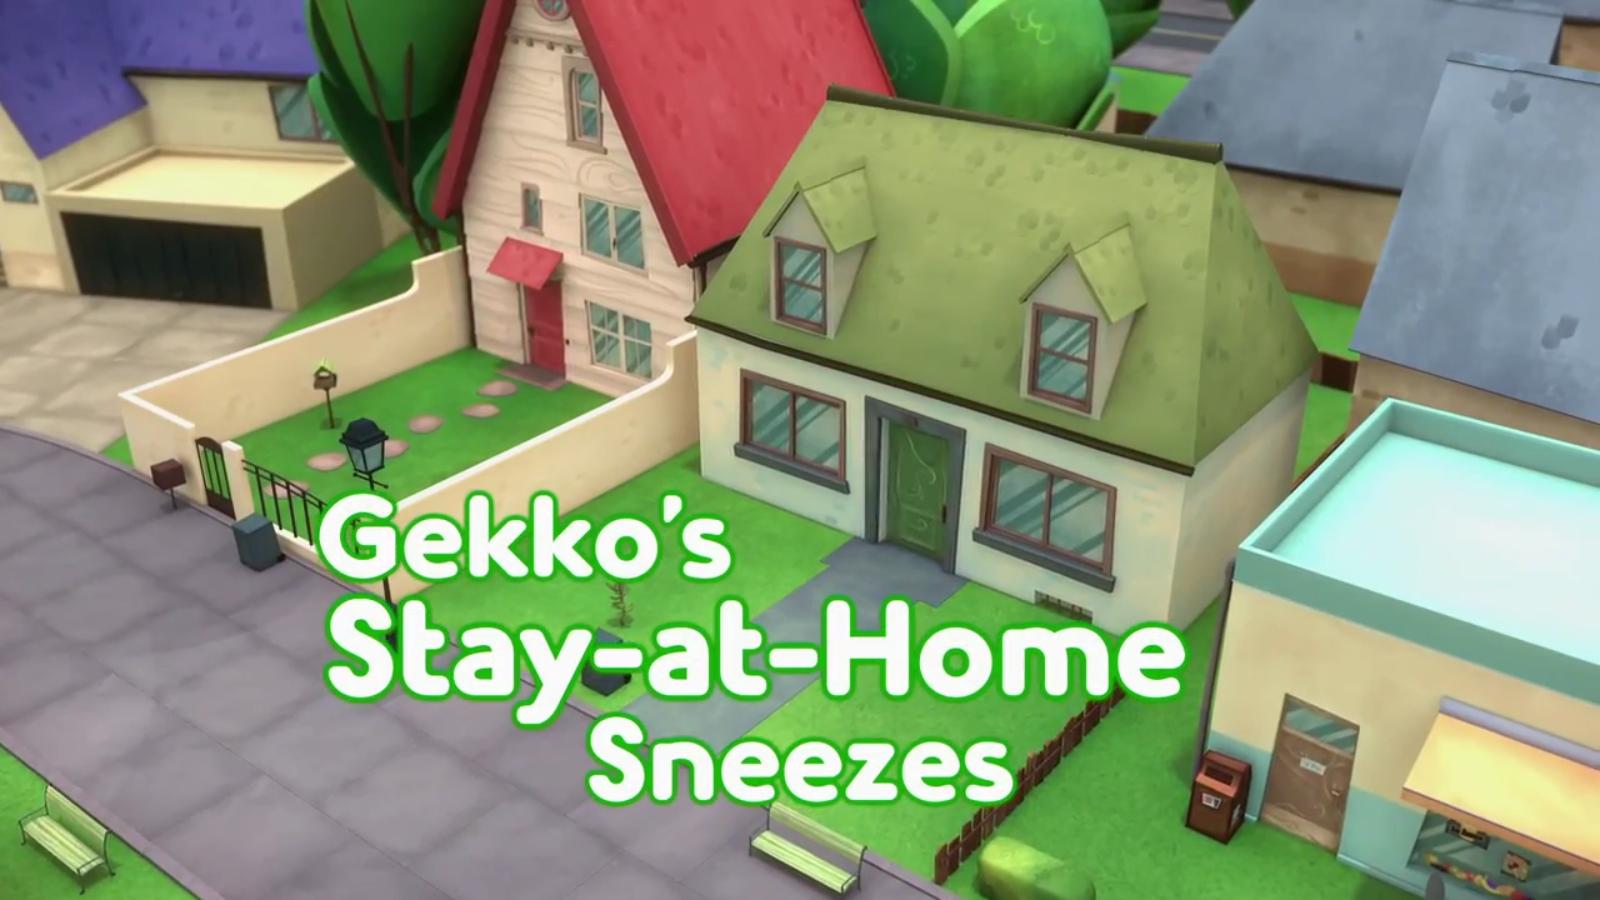 Gekko's Stay-at-Home Sneezes